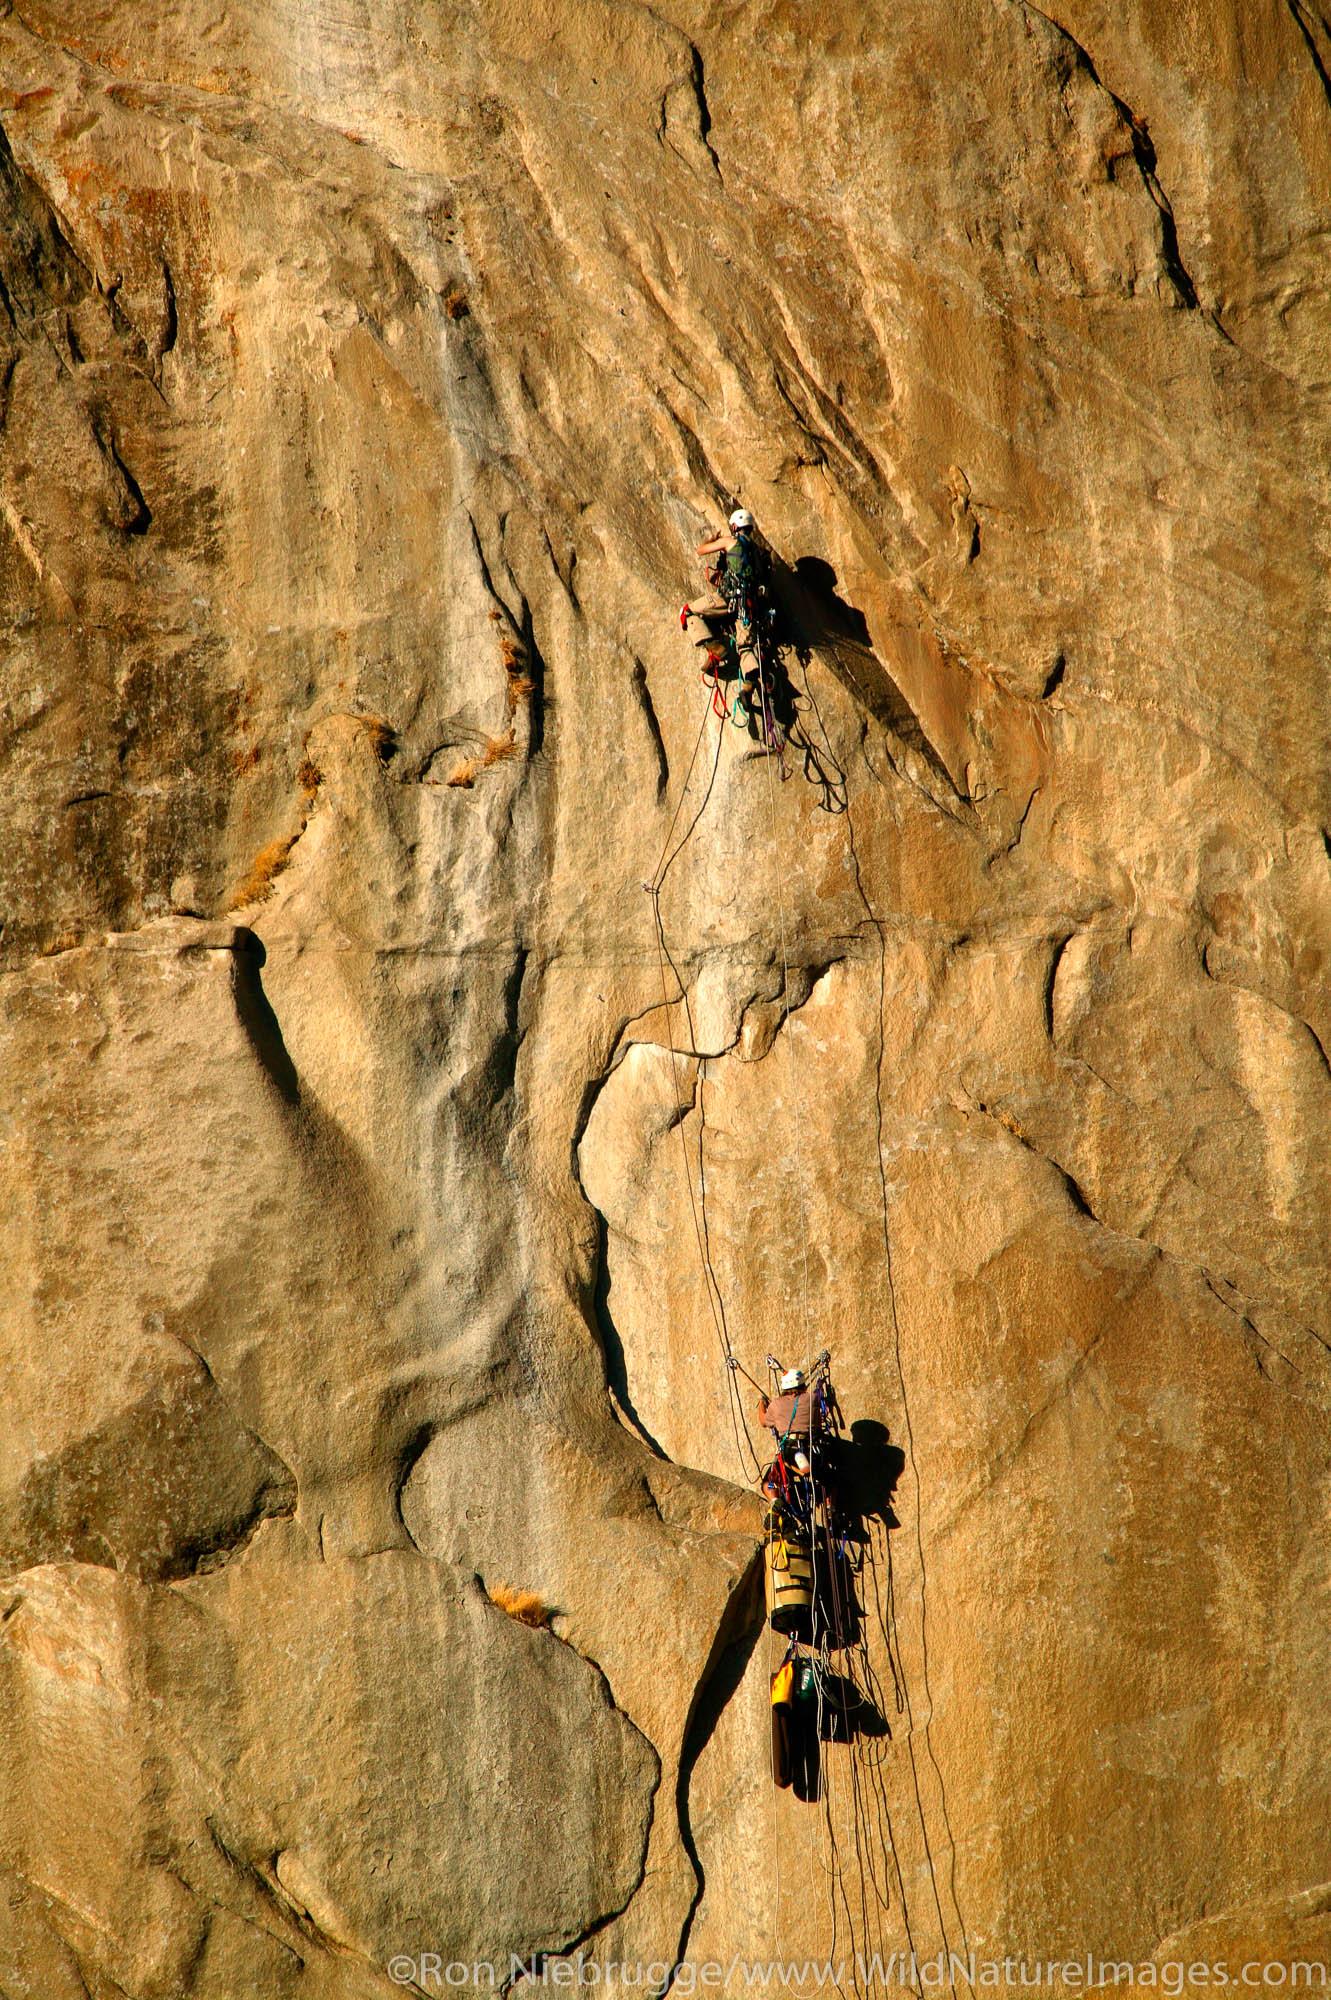 Climbers high upon El Capitan, Yosemite National Park, California.